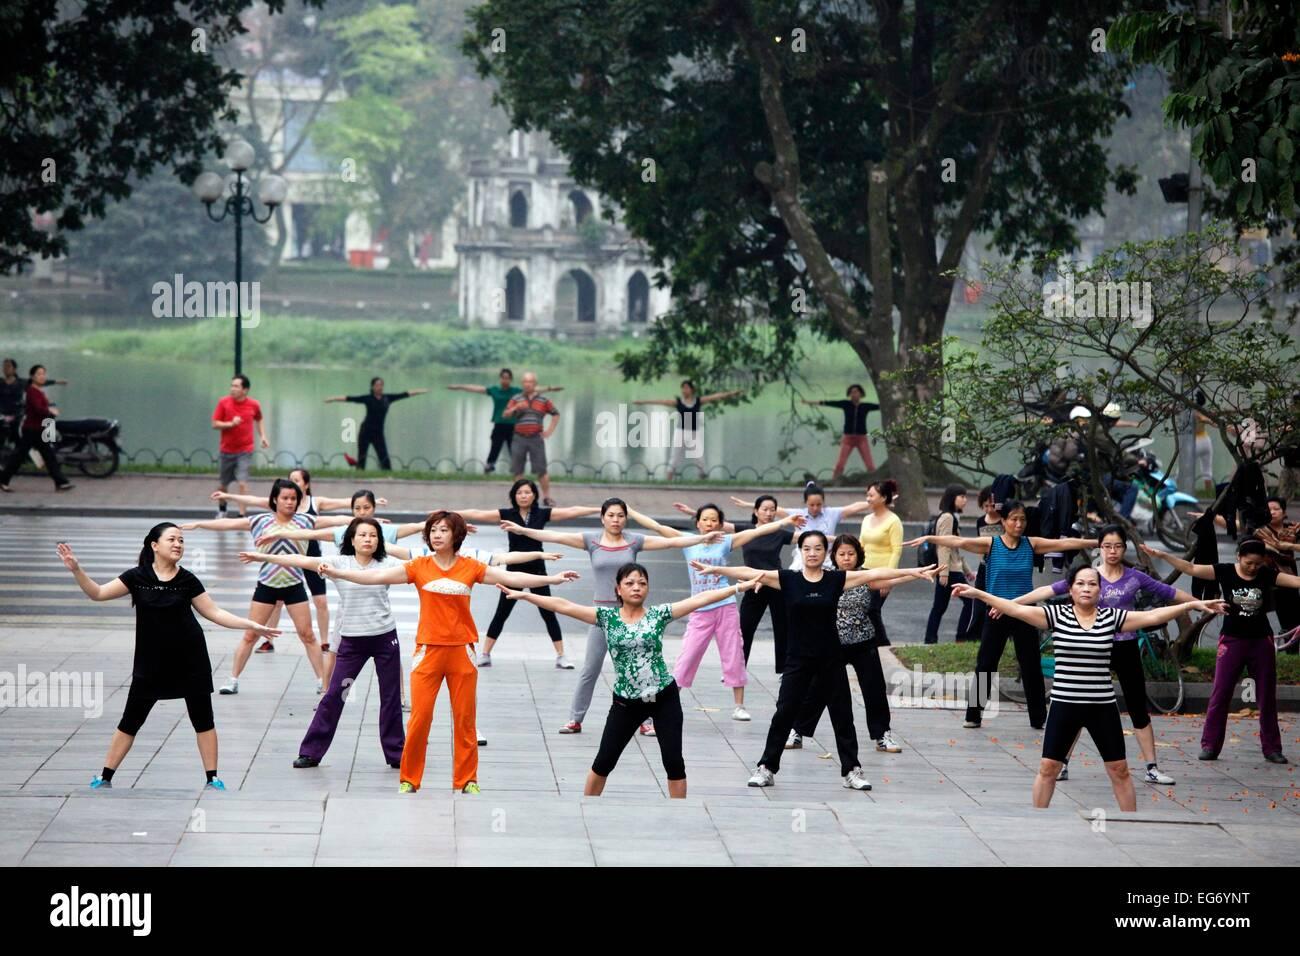 Early-morning exercise at Hoan Kiem Lake in Hanoi, Vietnam. - Stock Image